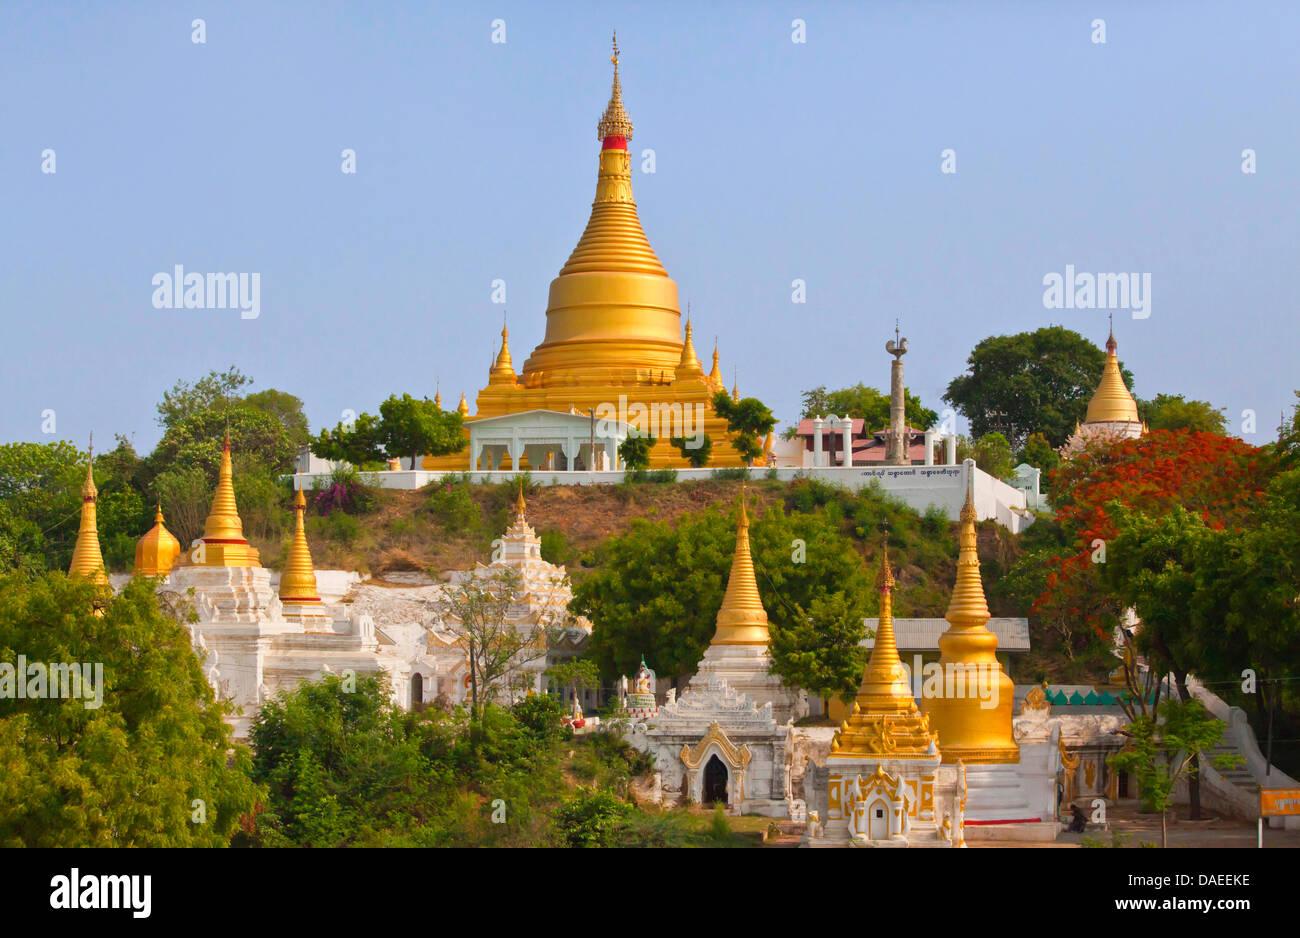 buddhistic monastery on Sagaing hill, Burma, Sagaing, Mandalay - Stock Image